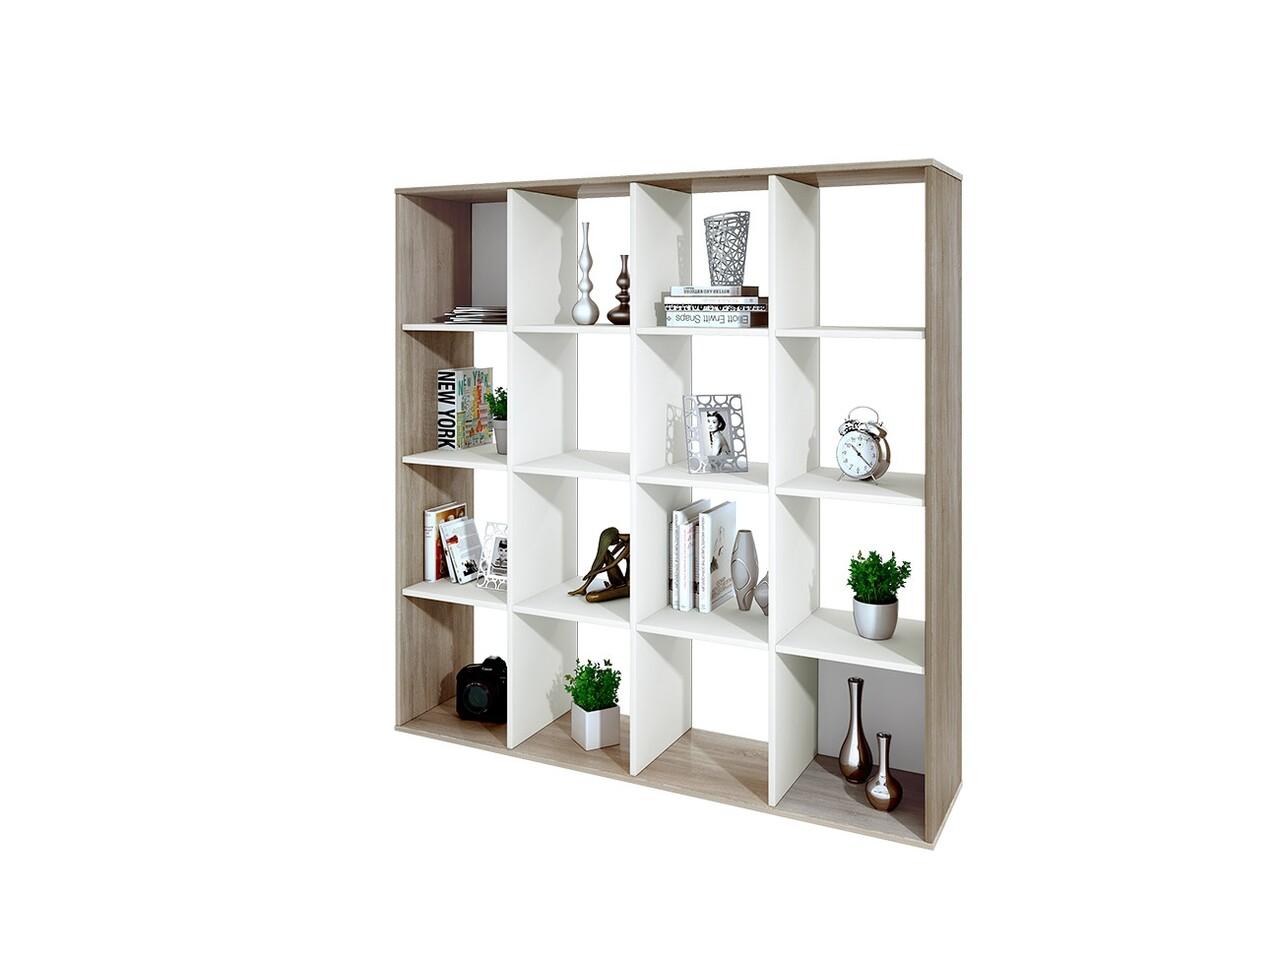 Biblioteca, Bedora, City 6228, 137.5 x 33 x 143.5 cm, PAL, bej/alb